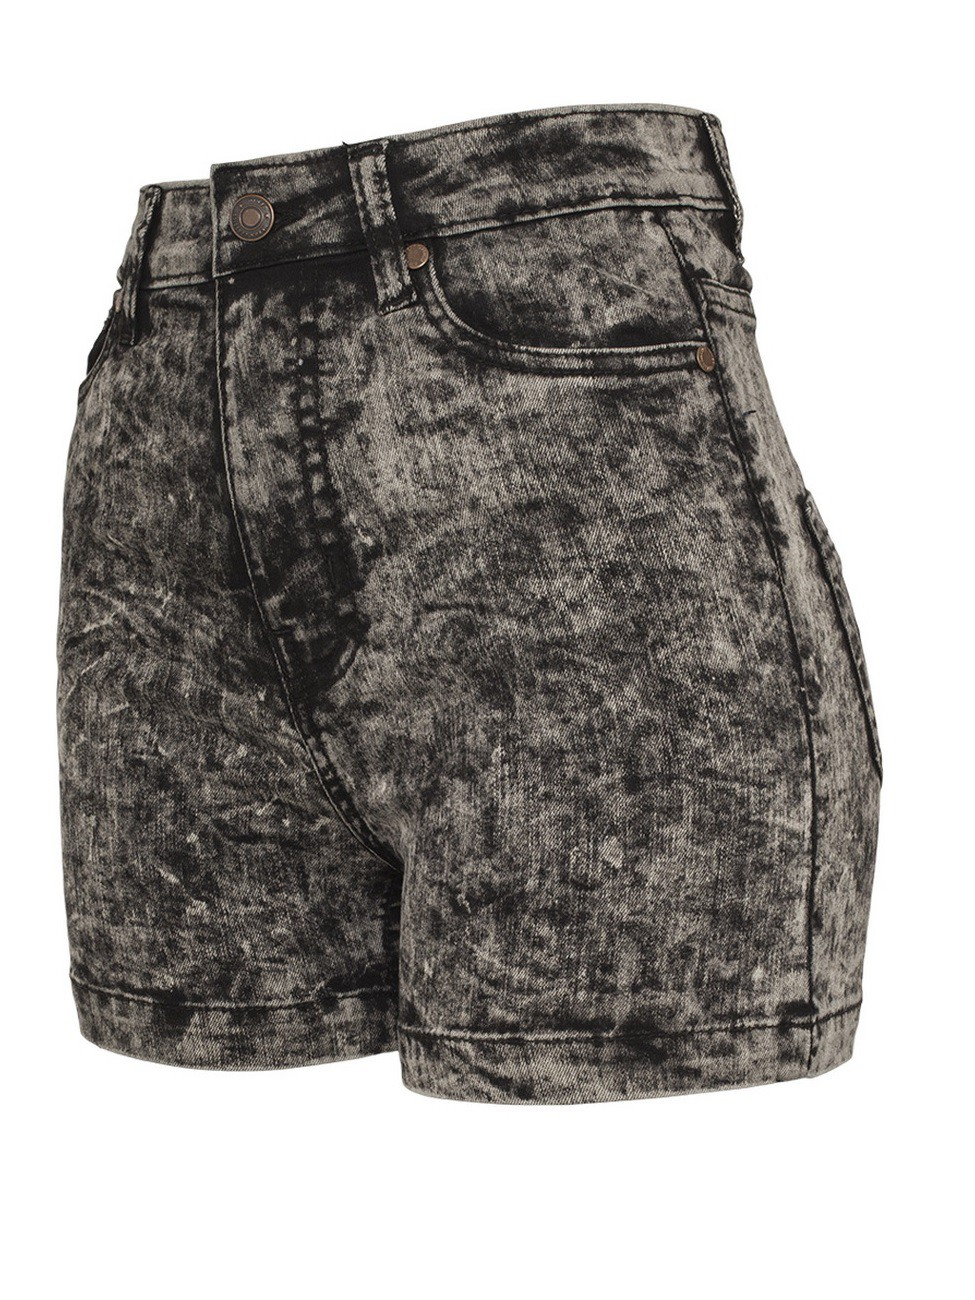 Urban Classics Damen High Waist Denim Skinny Shorts